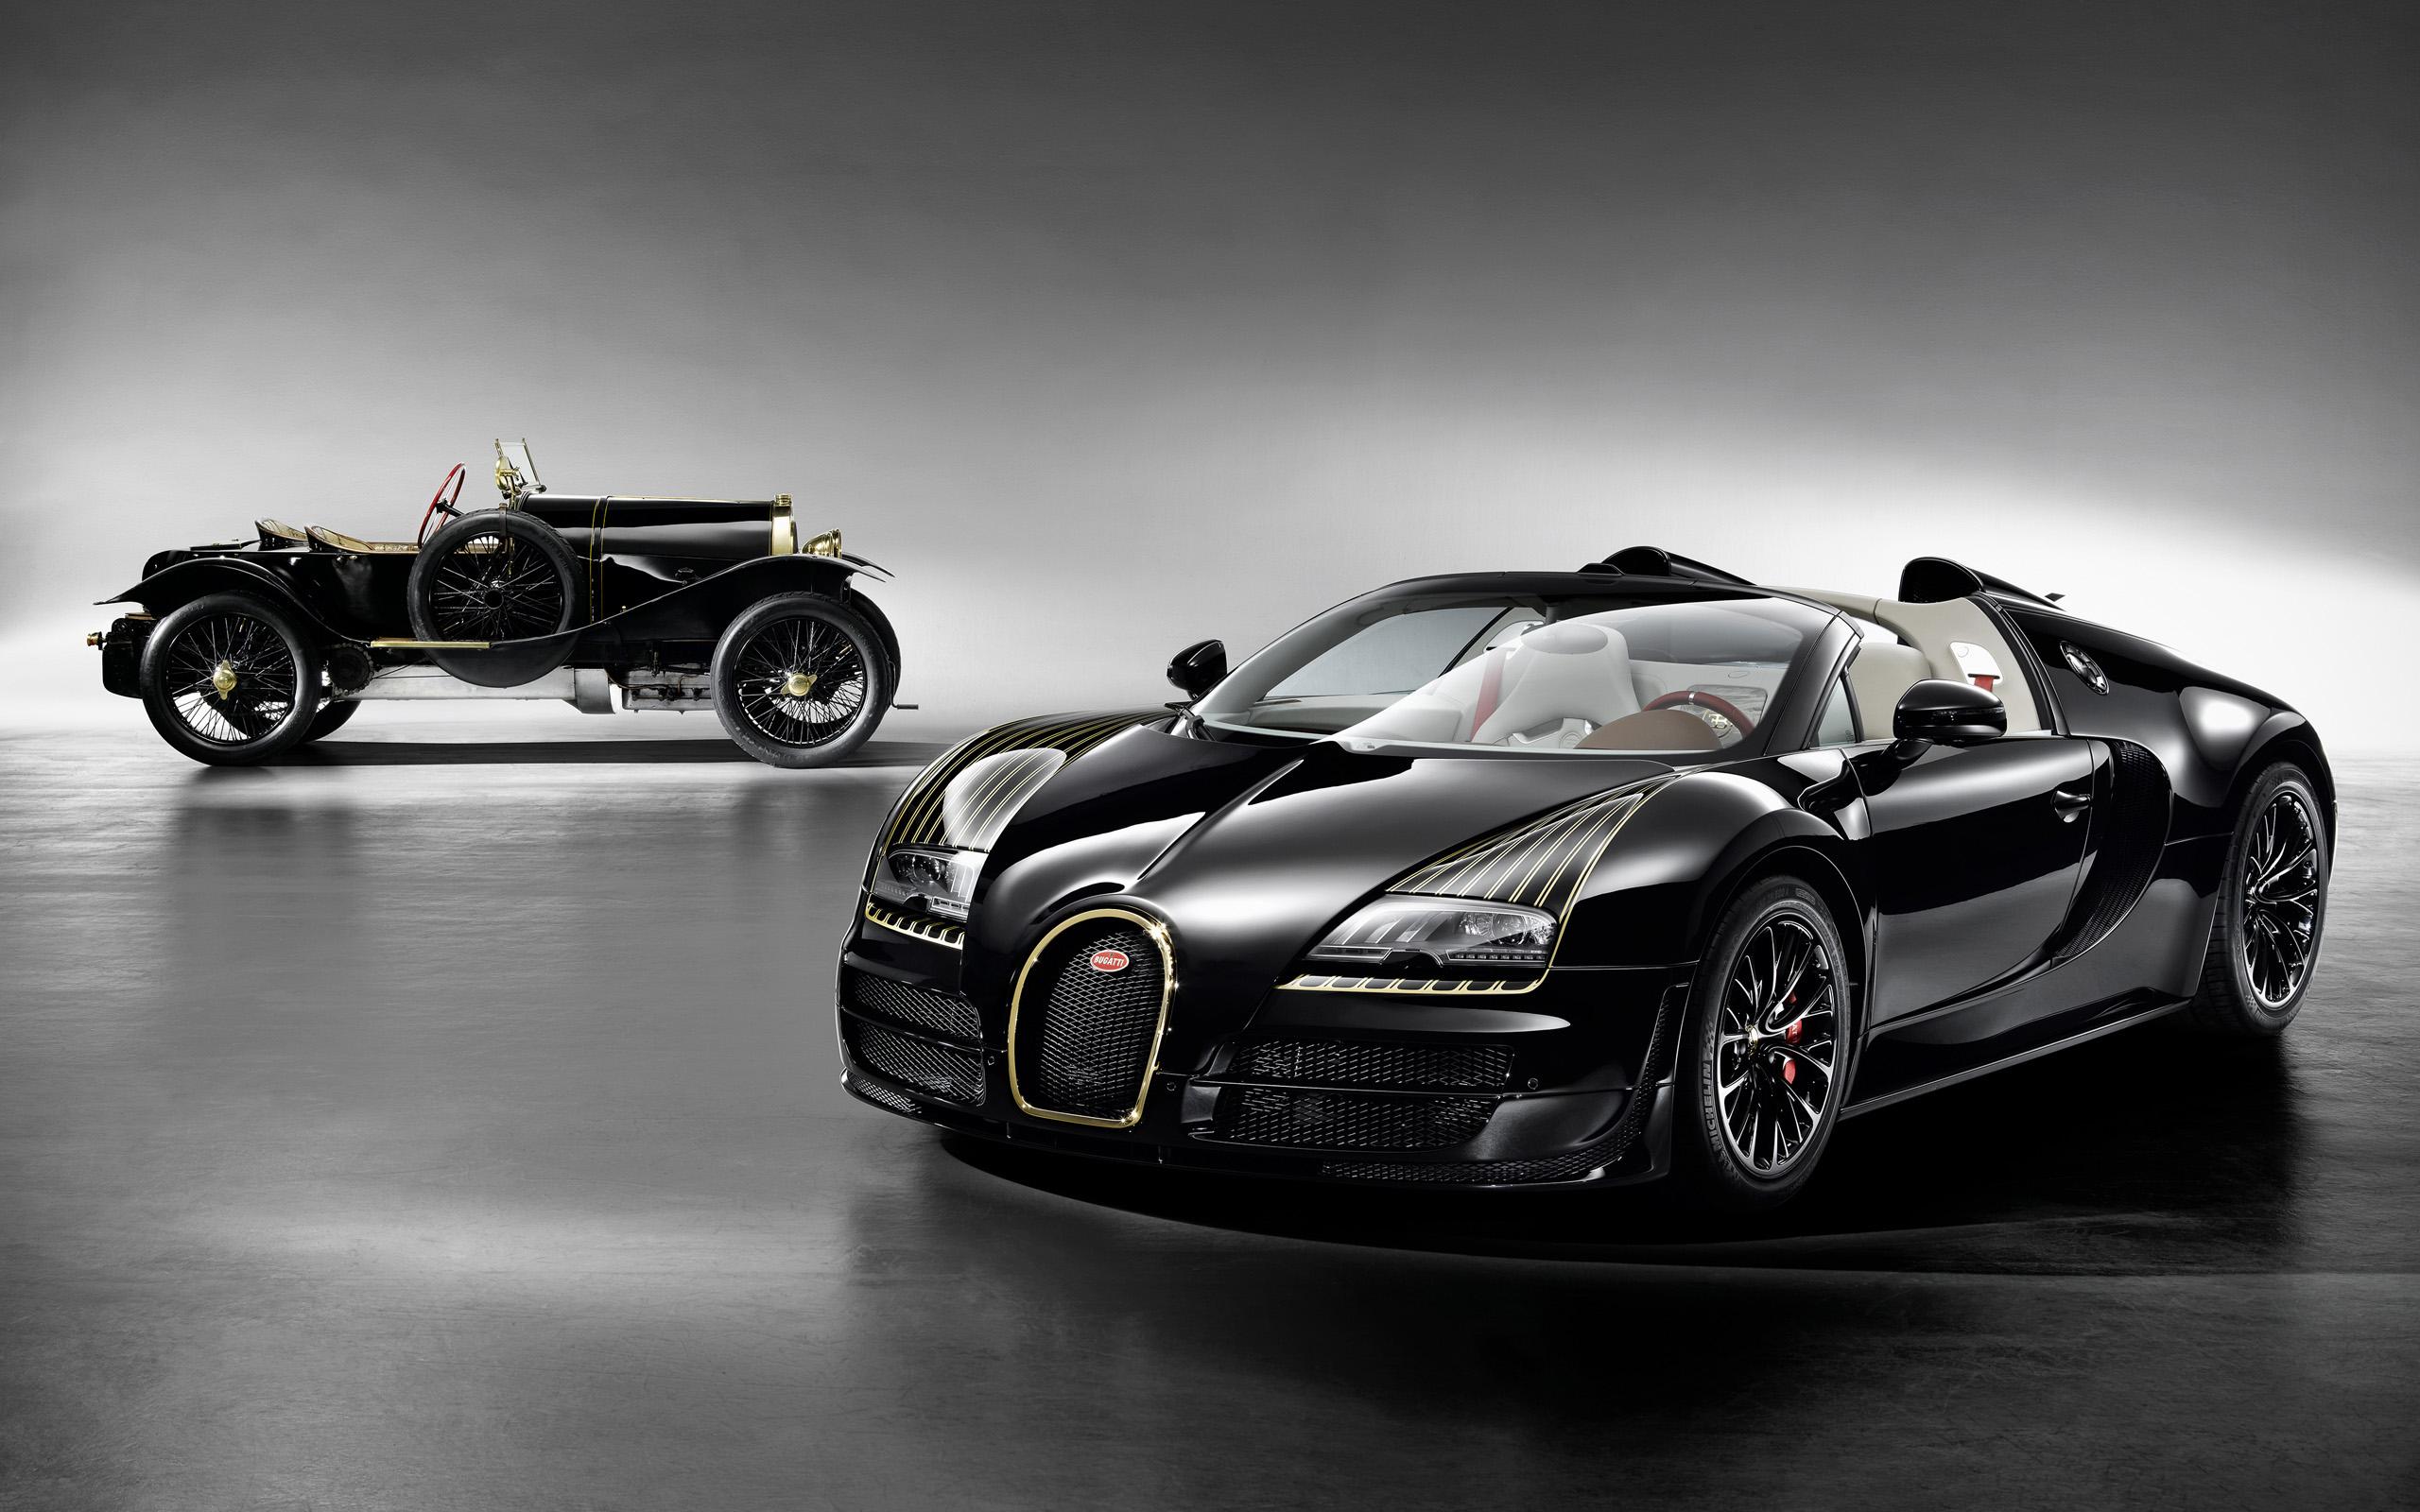 2014 bugatti veyron grand sport vitesse legend black bess 5 wallpaper hd car wallpapers. Black Bedroom Furniture Sets. Home Design Ideas